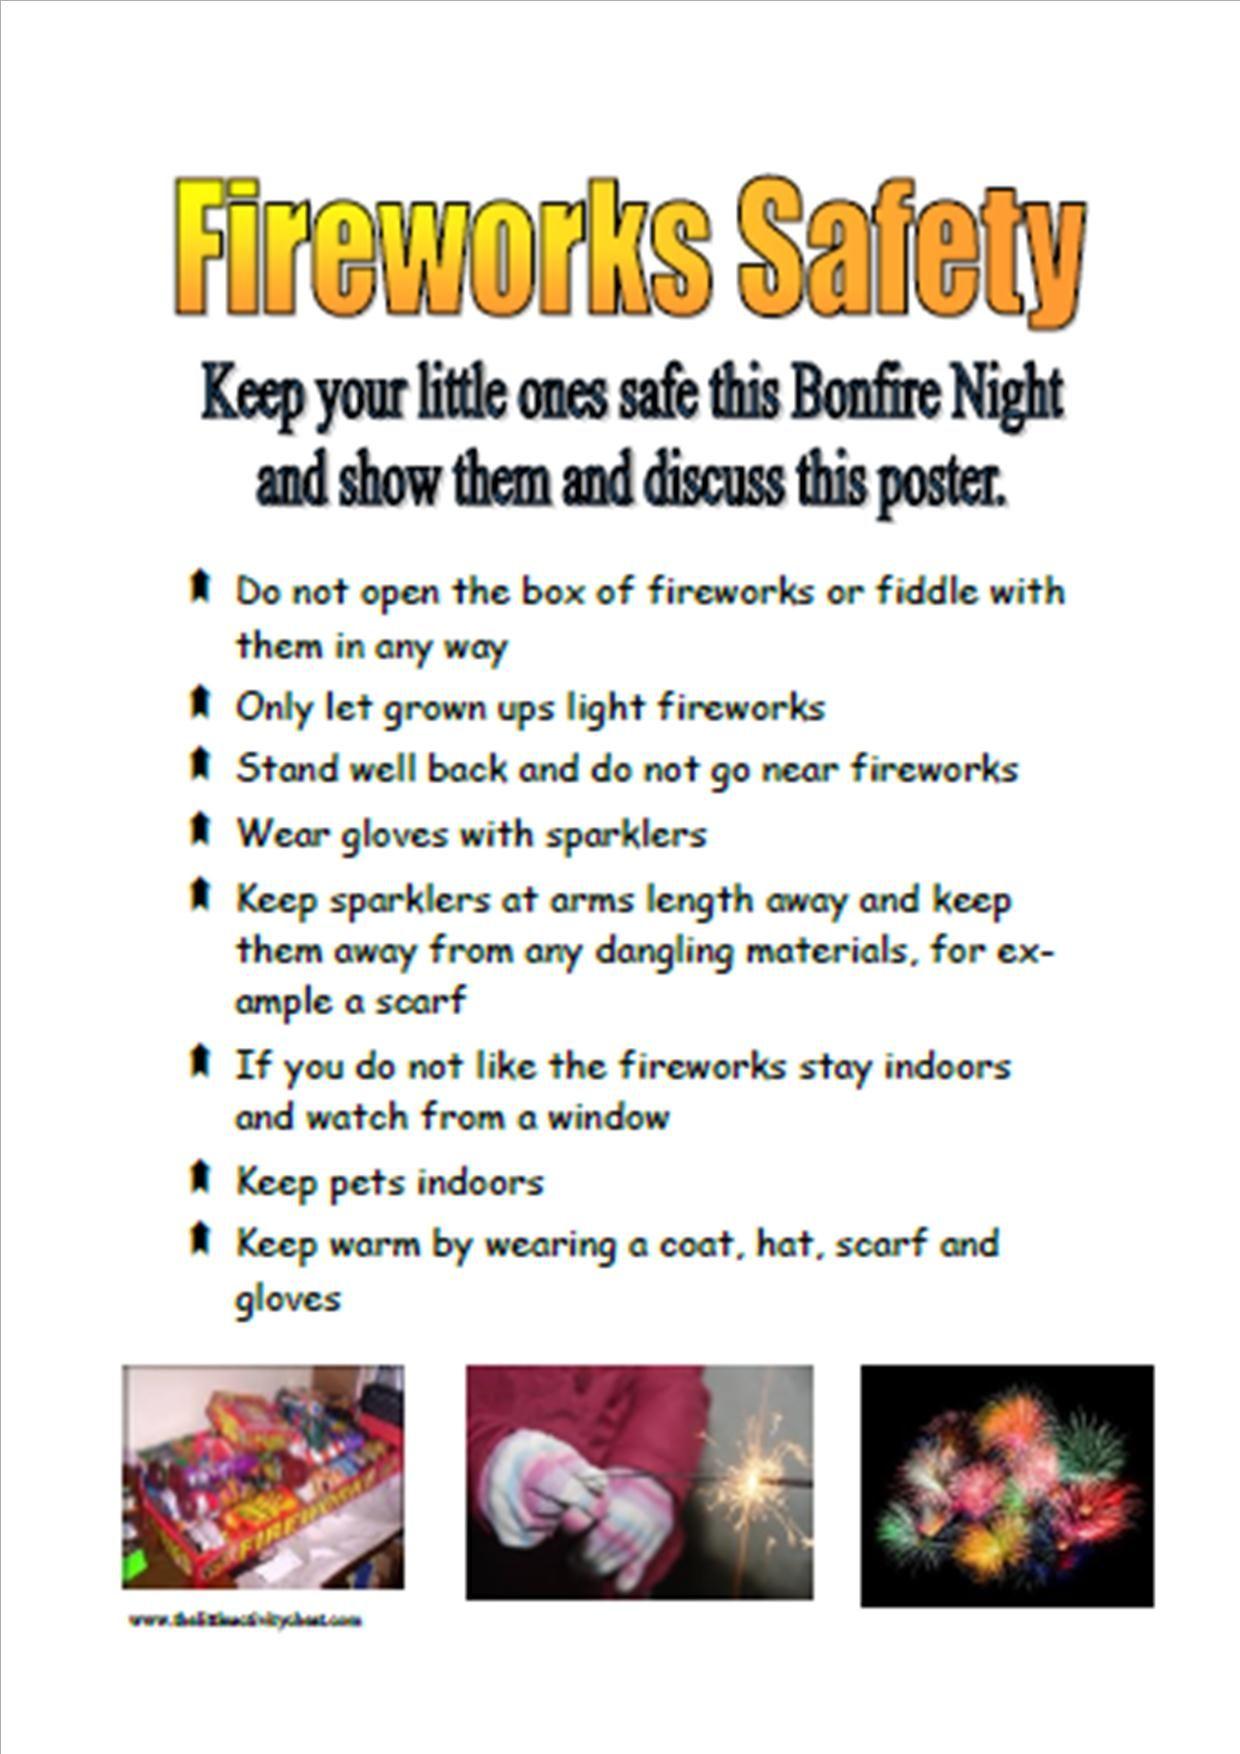 firework safety poster img [ 1240 x 1754 Pixel ]